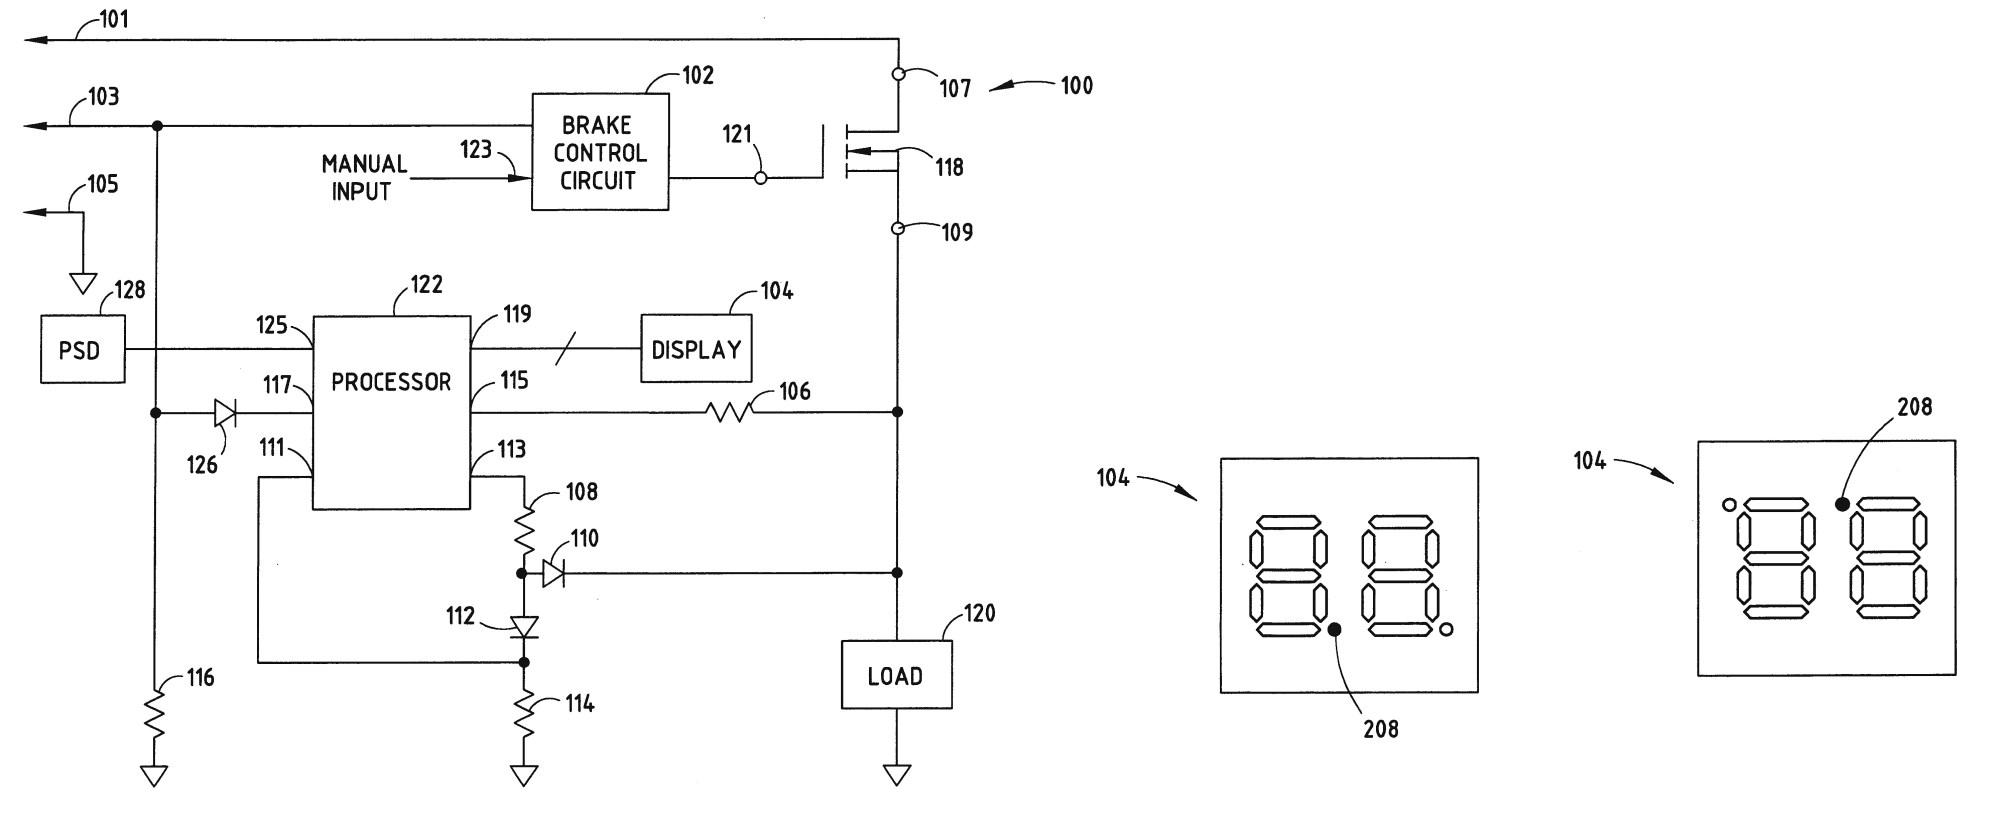 hight resolution of prodigy brake controller wiring diagram wiring diagram for trailer brake controller new tekonsha p3 prodigy